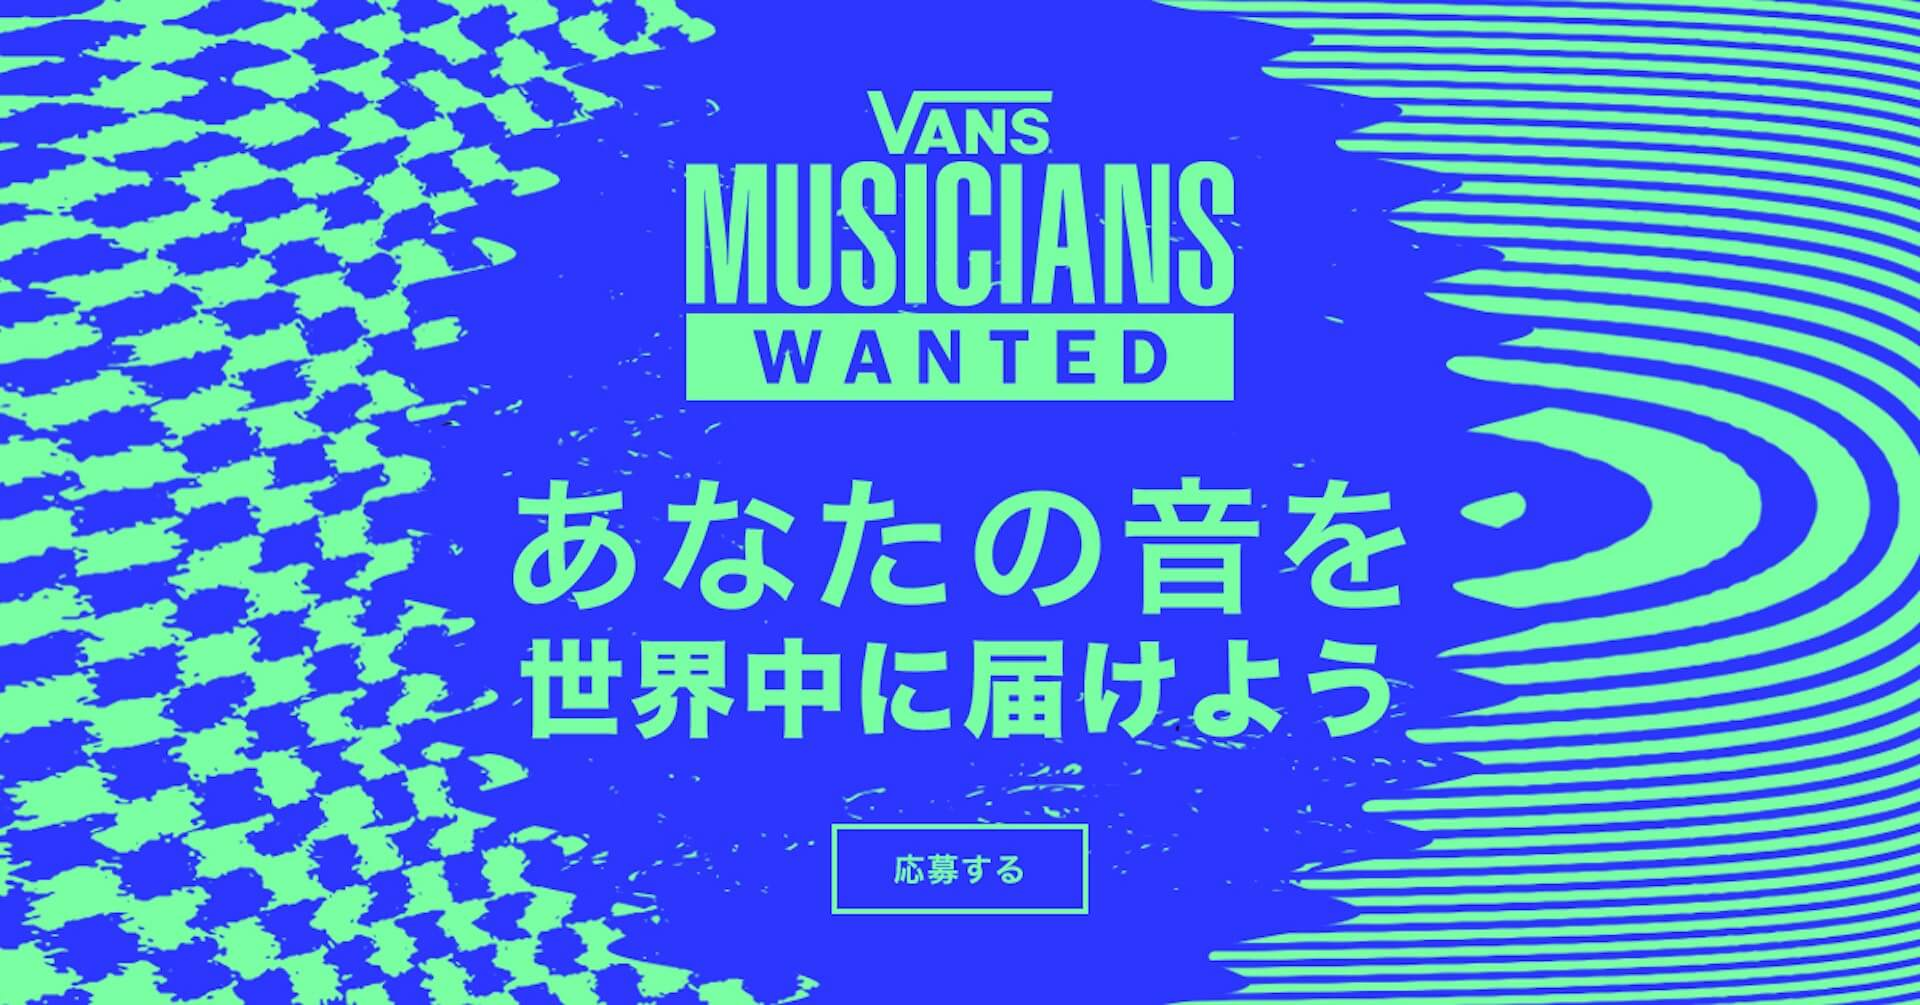 VANS主催の音楽コンテスト<VANS MUSICIANS WANTED>がエントリー受付中!優勝者はAnderson.Paakとの共演も music200909_vans_musicianswanted_01